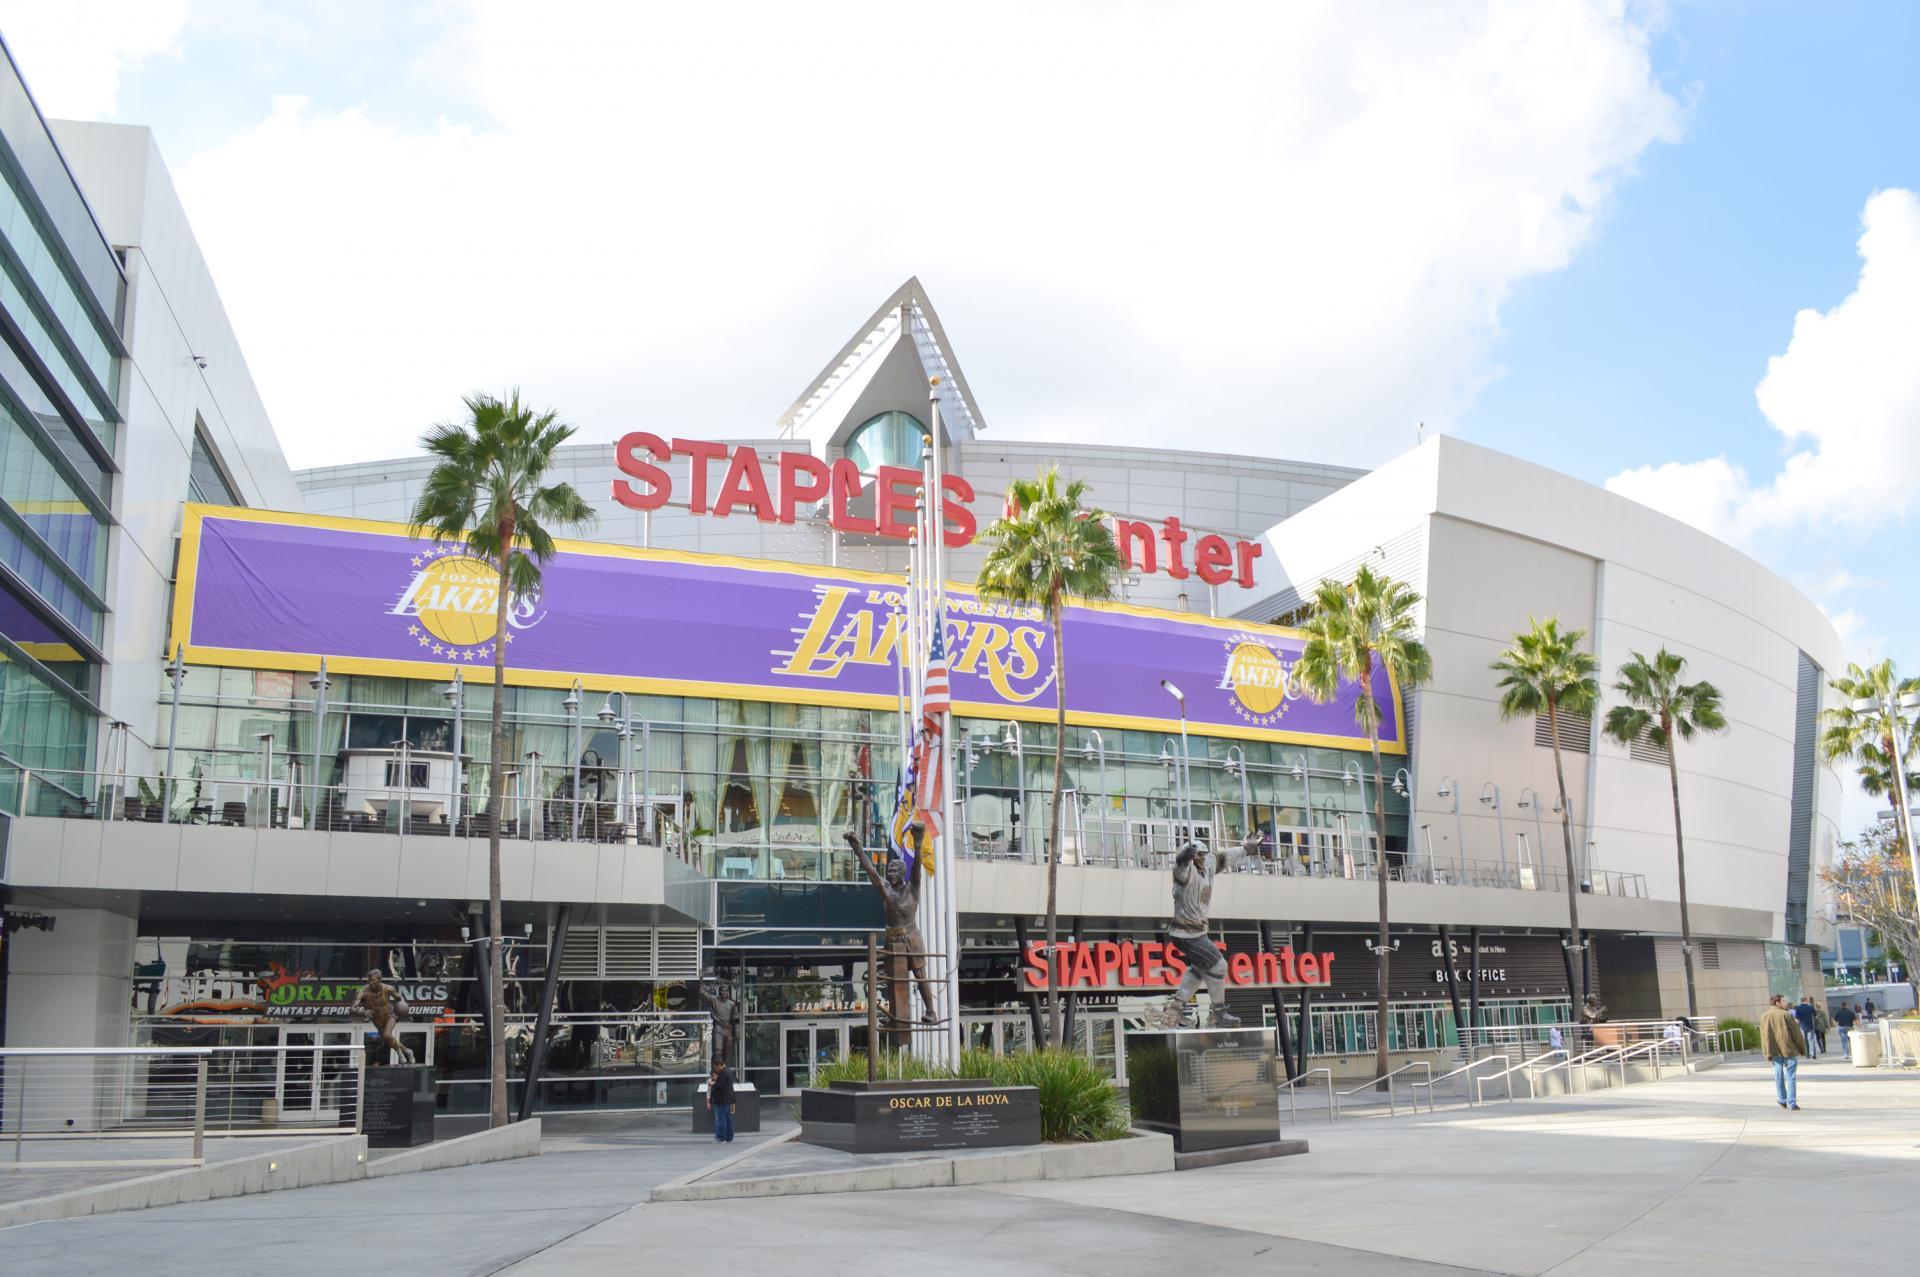 LA Lakers Game